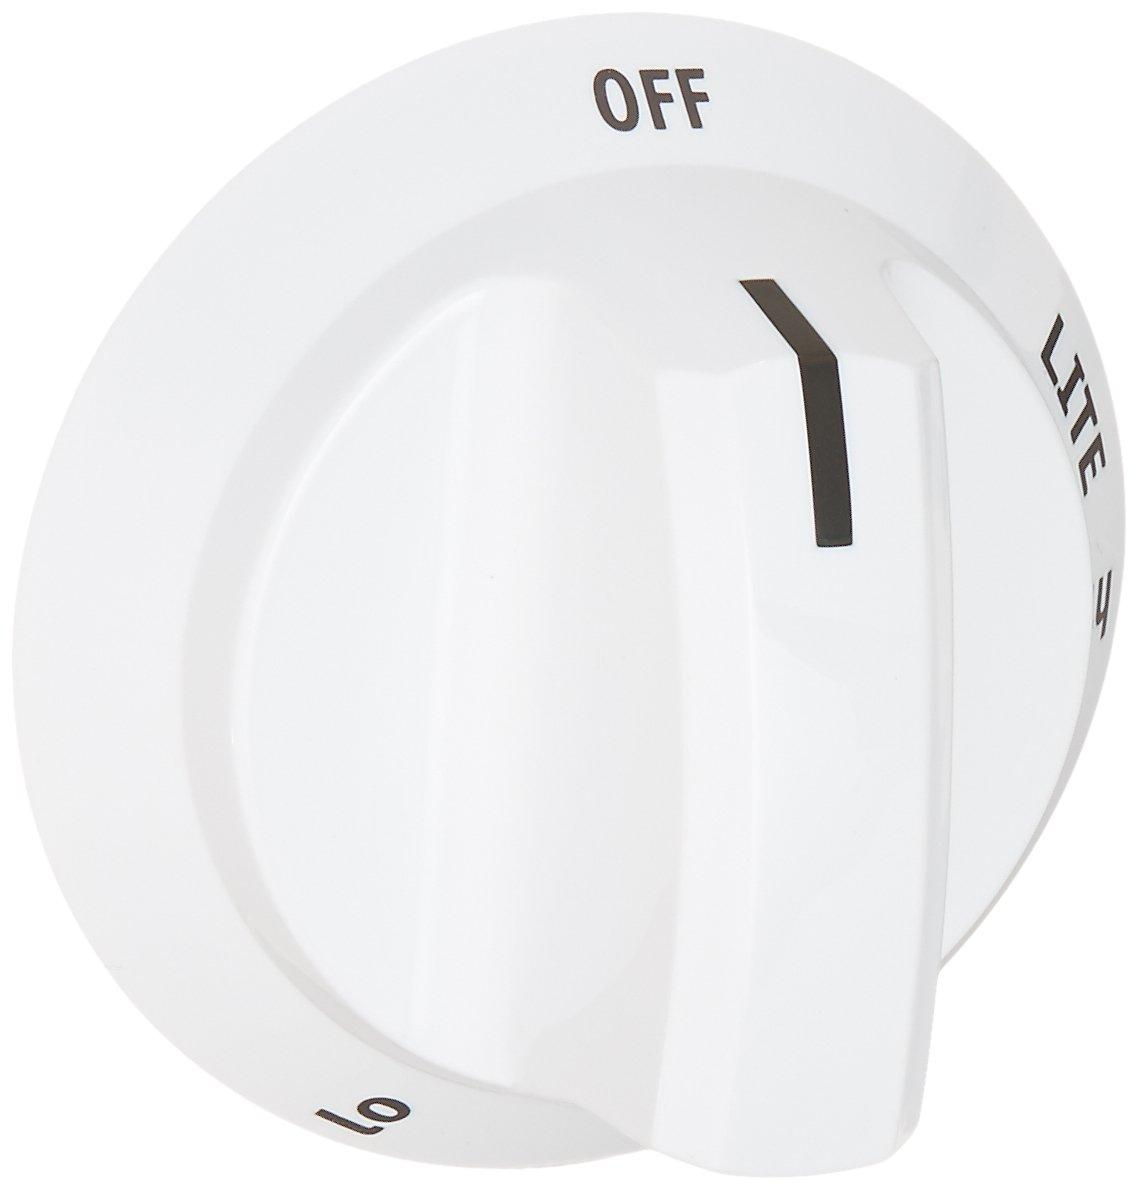 Frigidaire 316544013 Range/Stove/Oven Control Knob